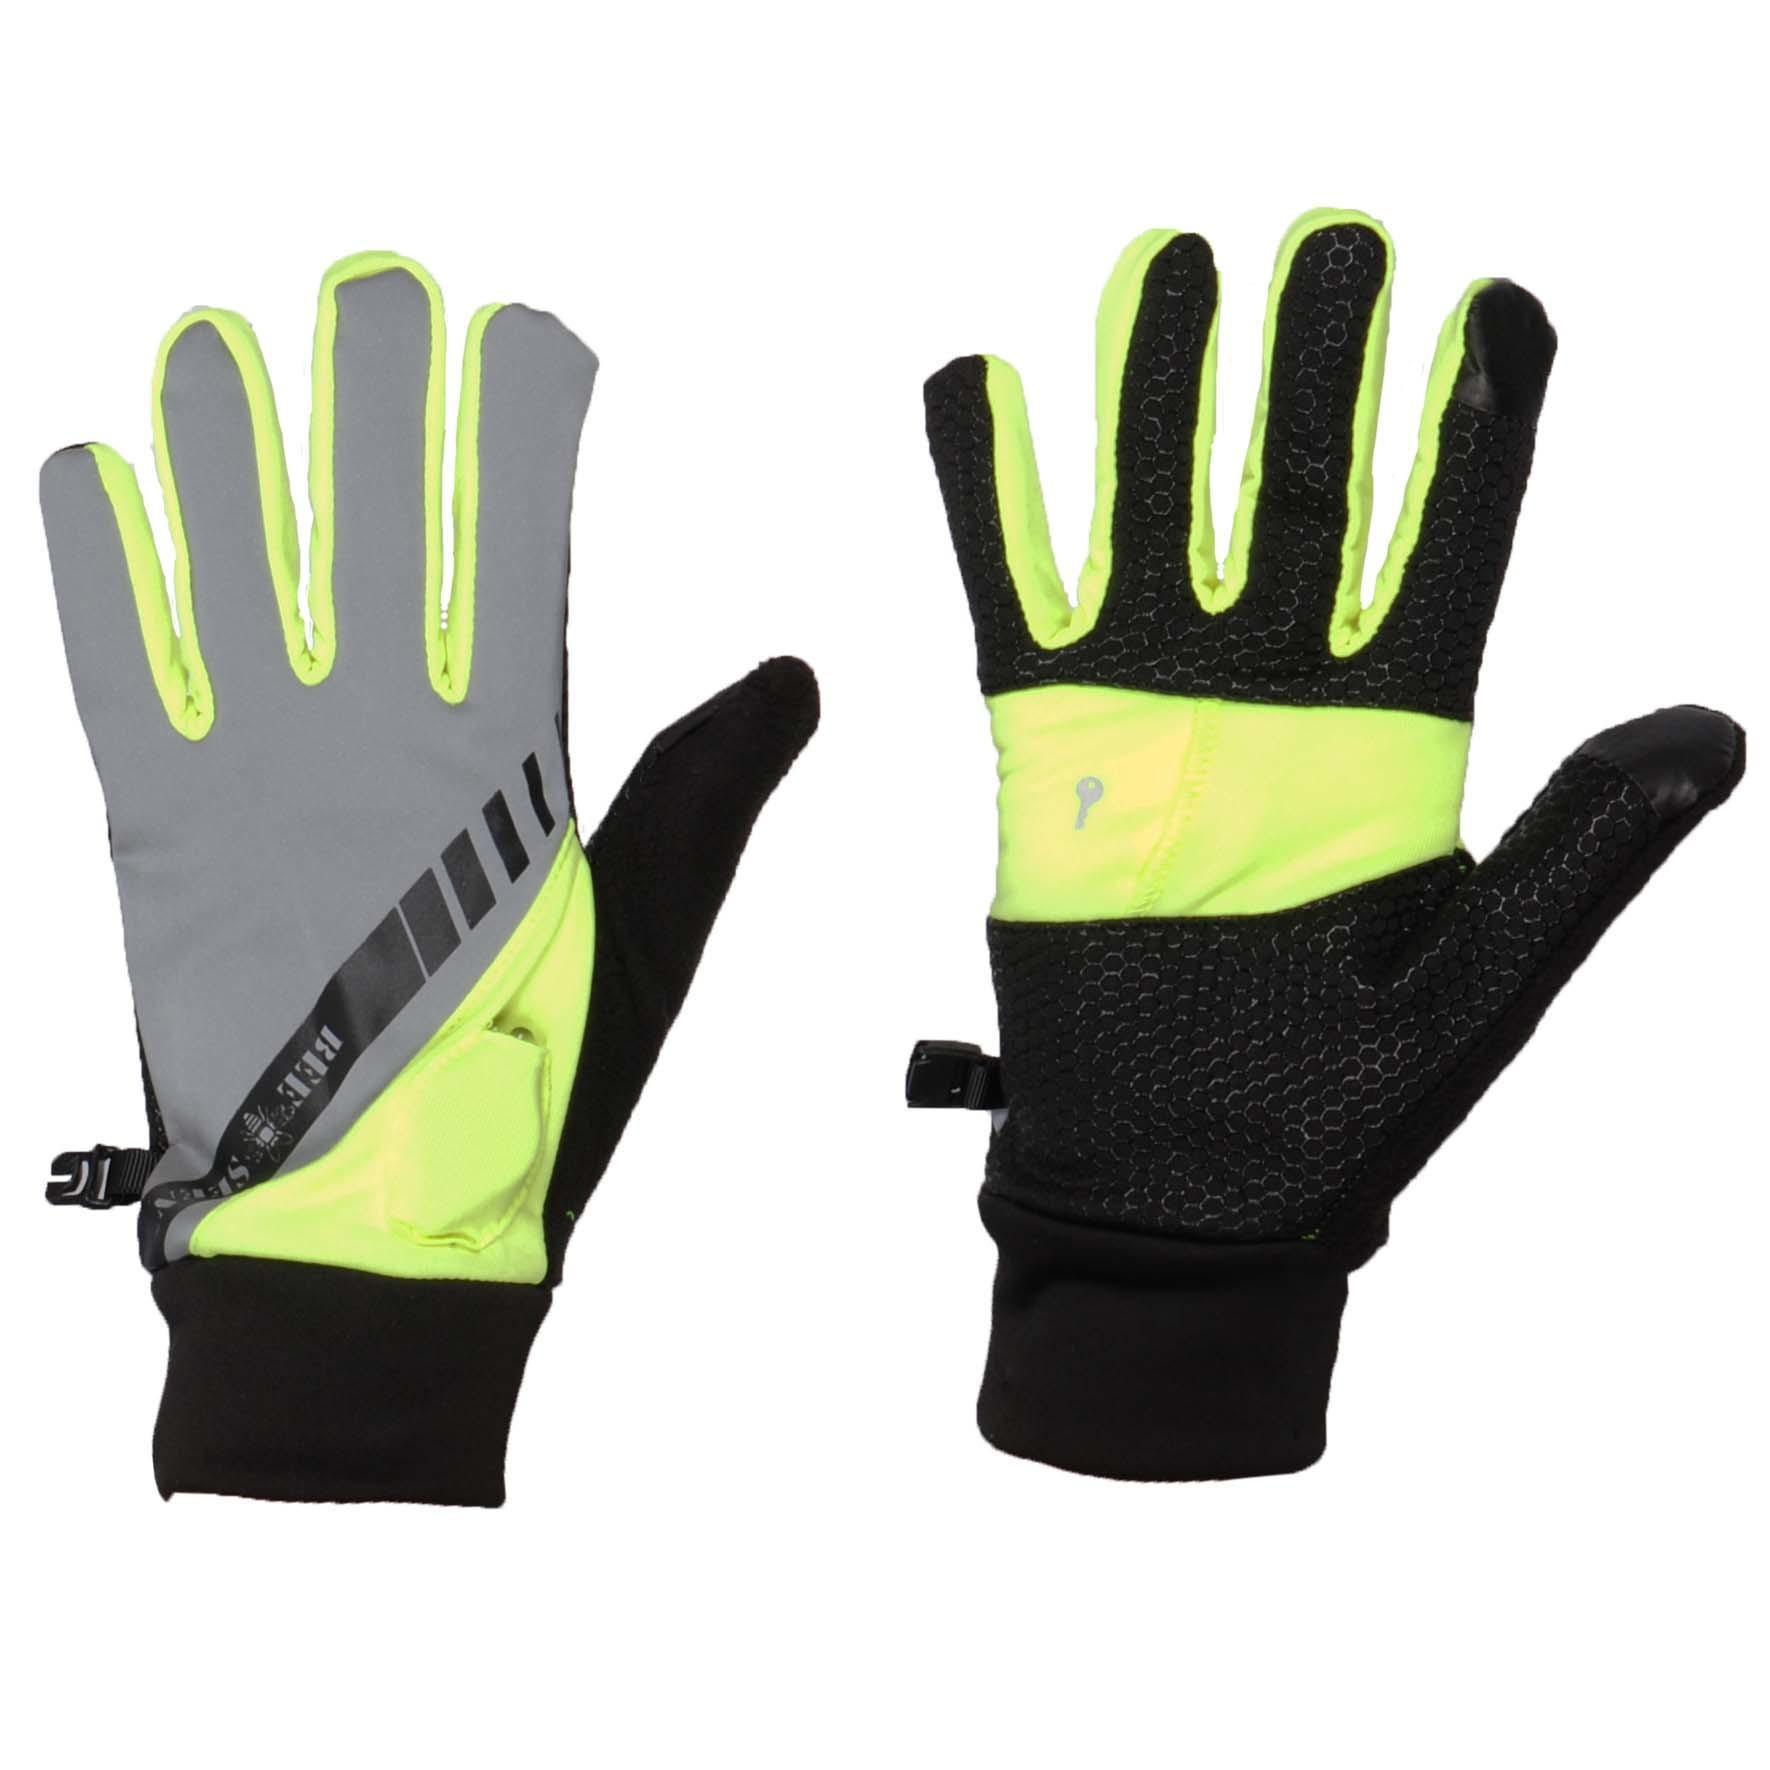 Reflective Led handschoenen zwart/grijs maat:xl-xxl